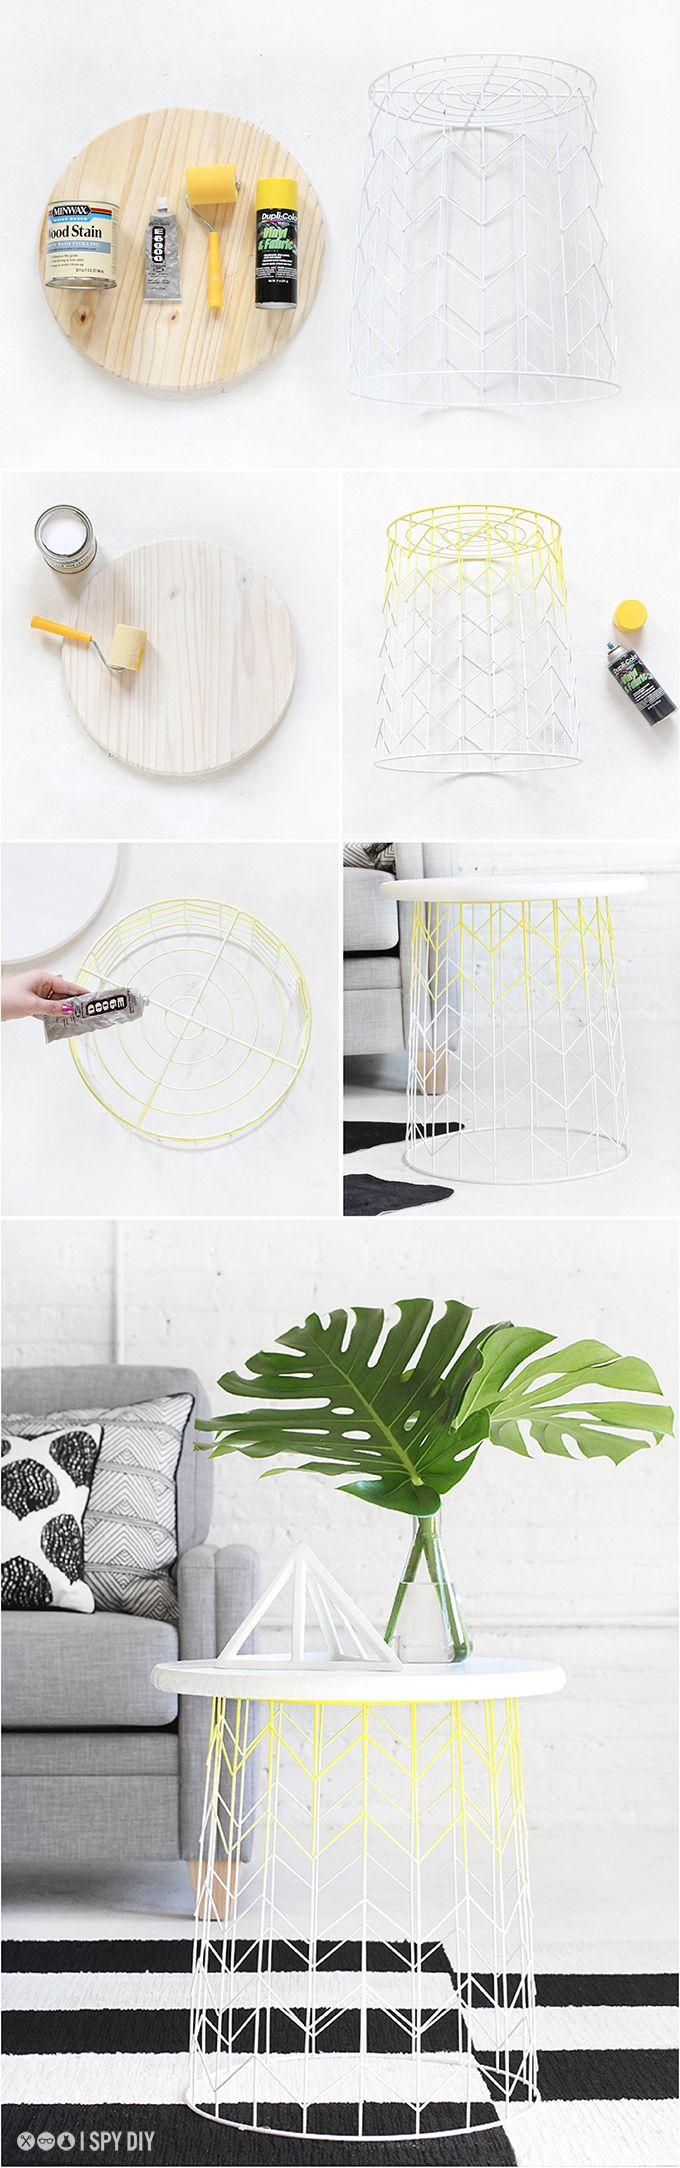 via http://ispydiy.com/my-diy-wire-basket-side-table/